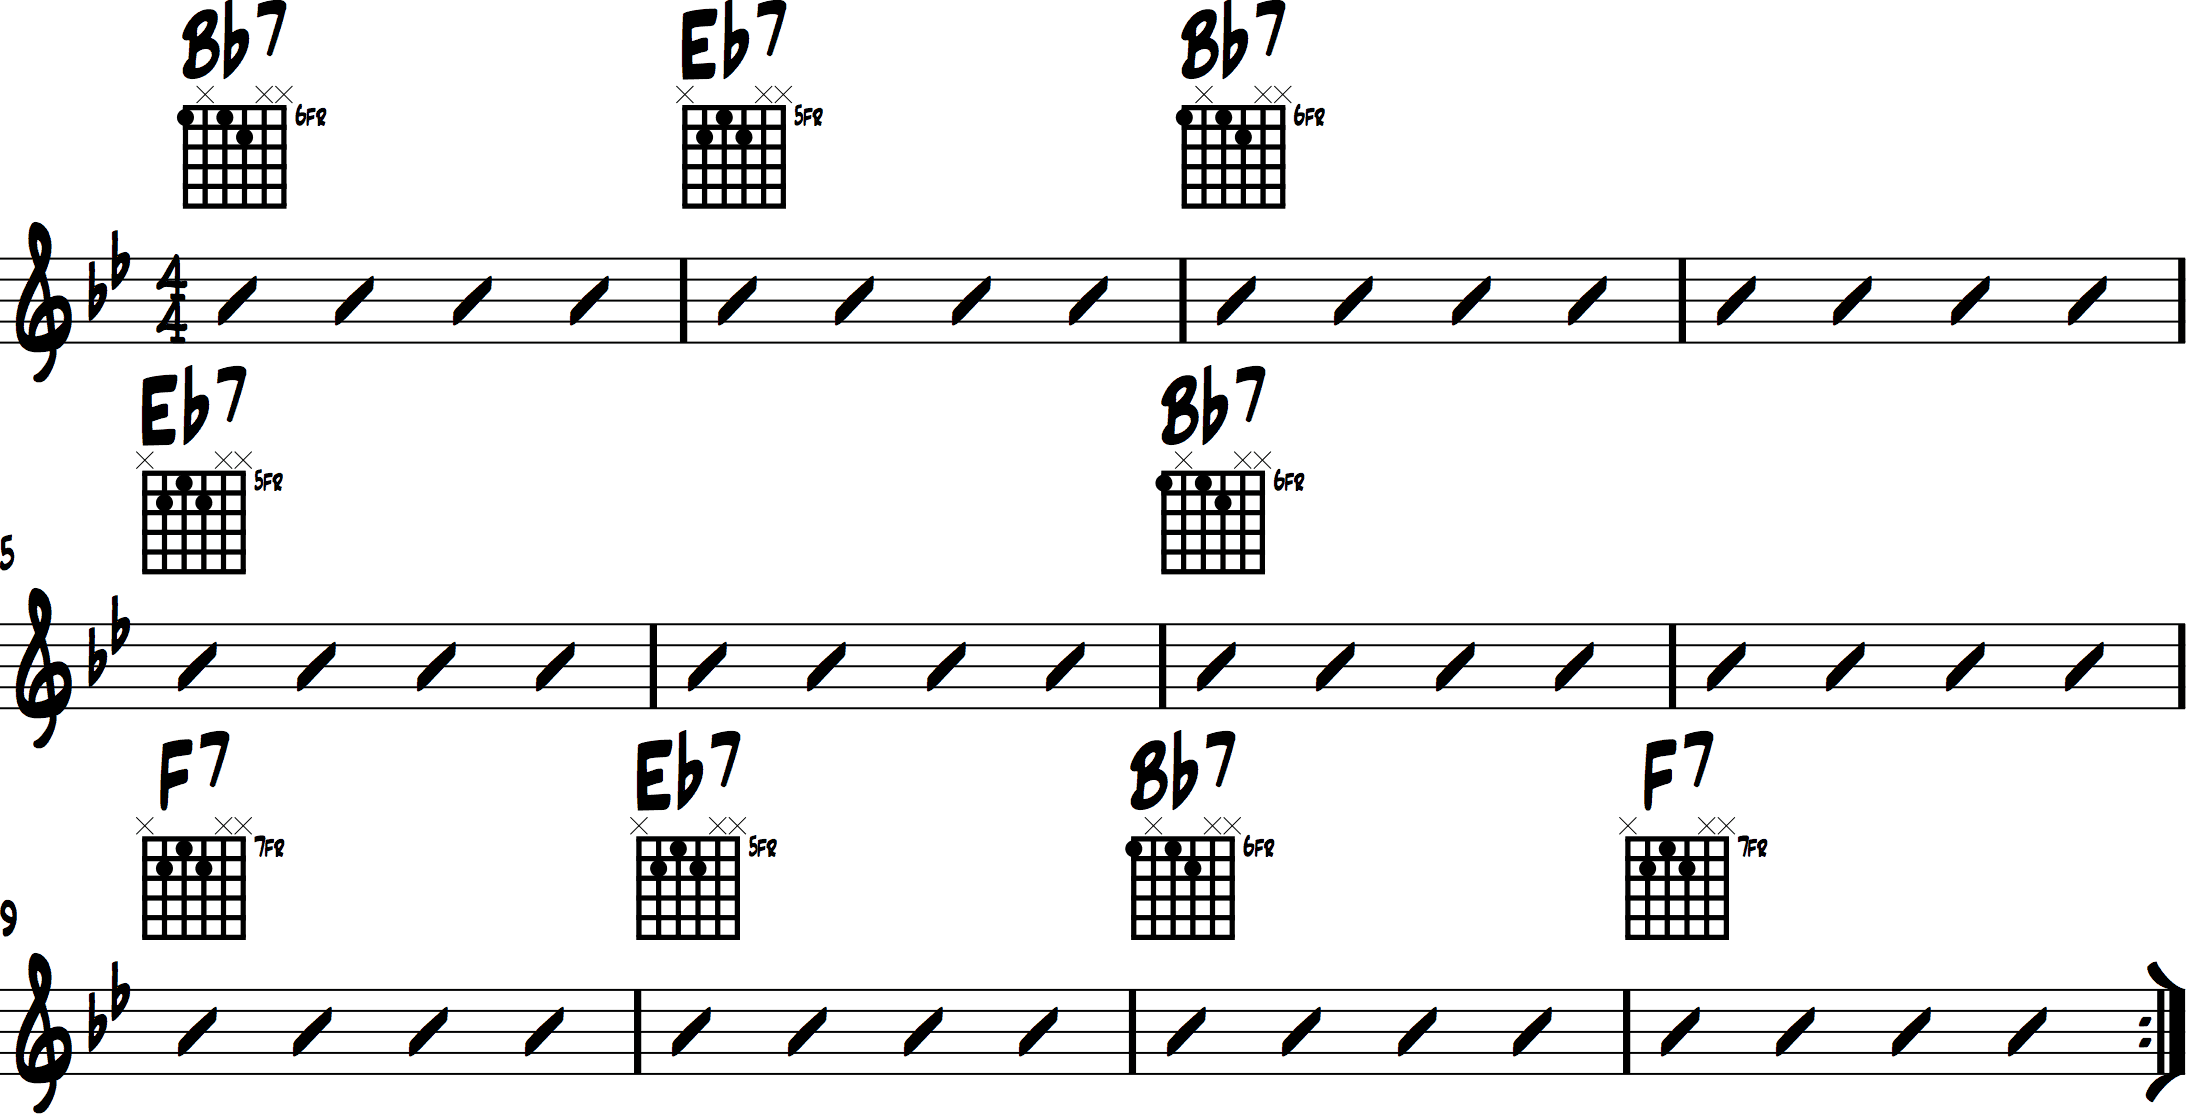 Jazz Chord Progressions 1